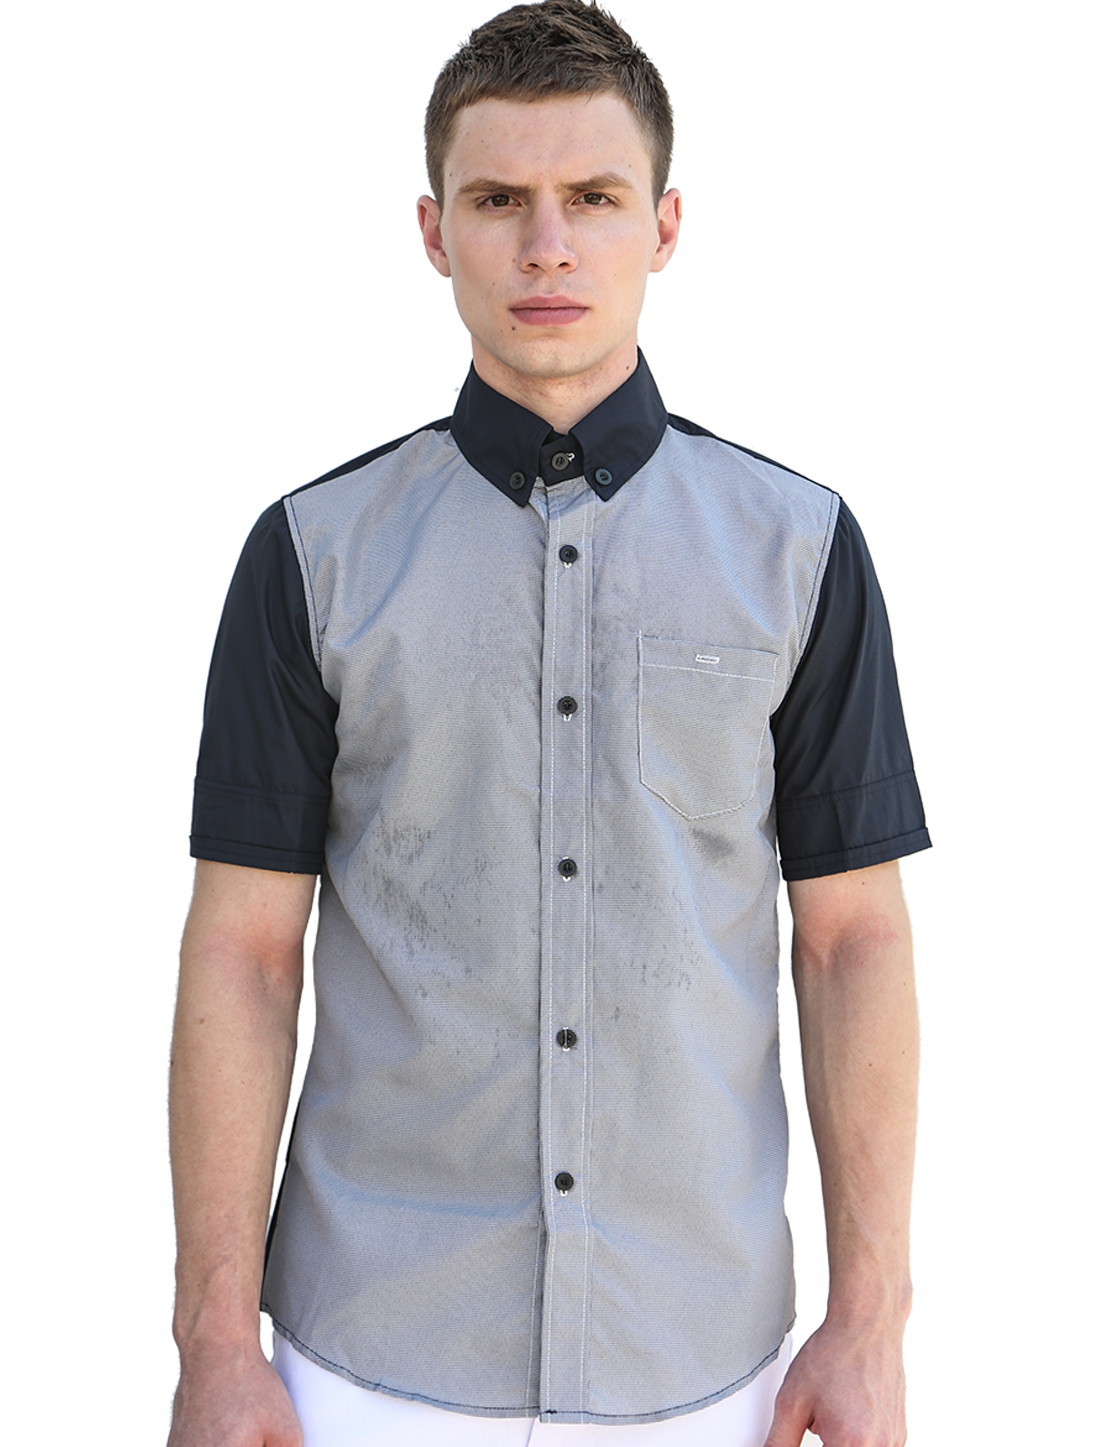 Men Short Sleeves Houndstooth Prints Button Down Shirt Navy Blue L